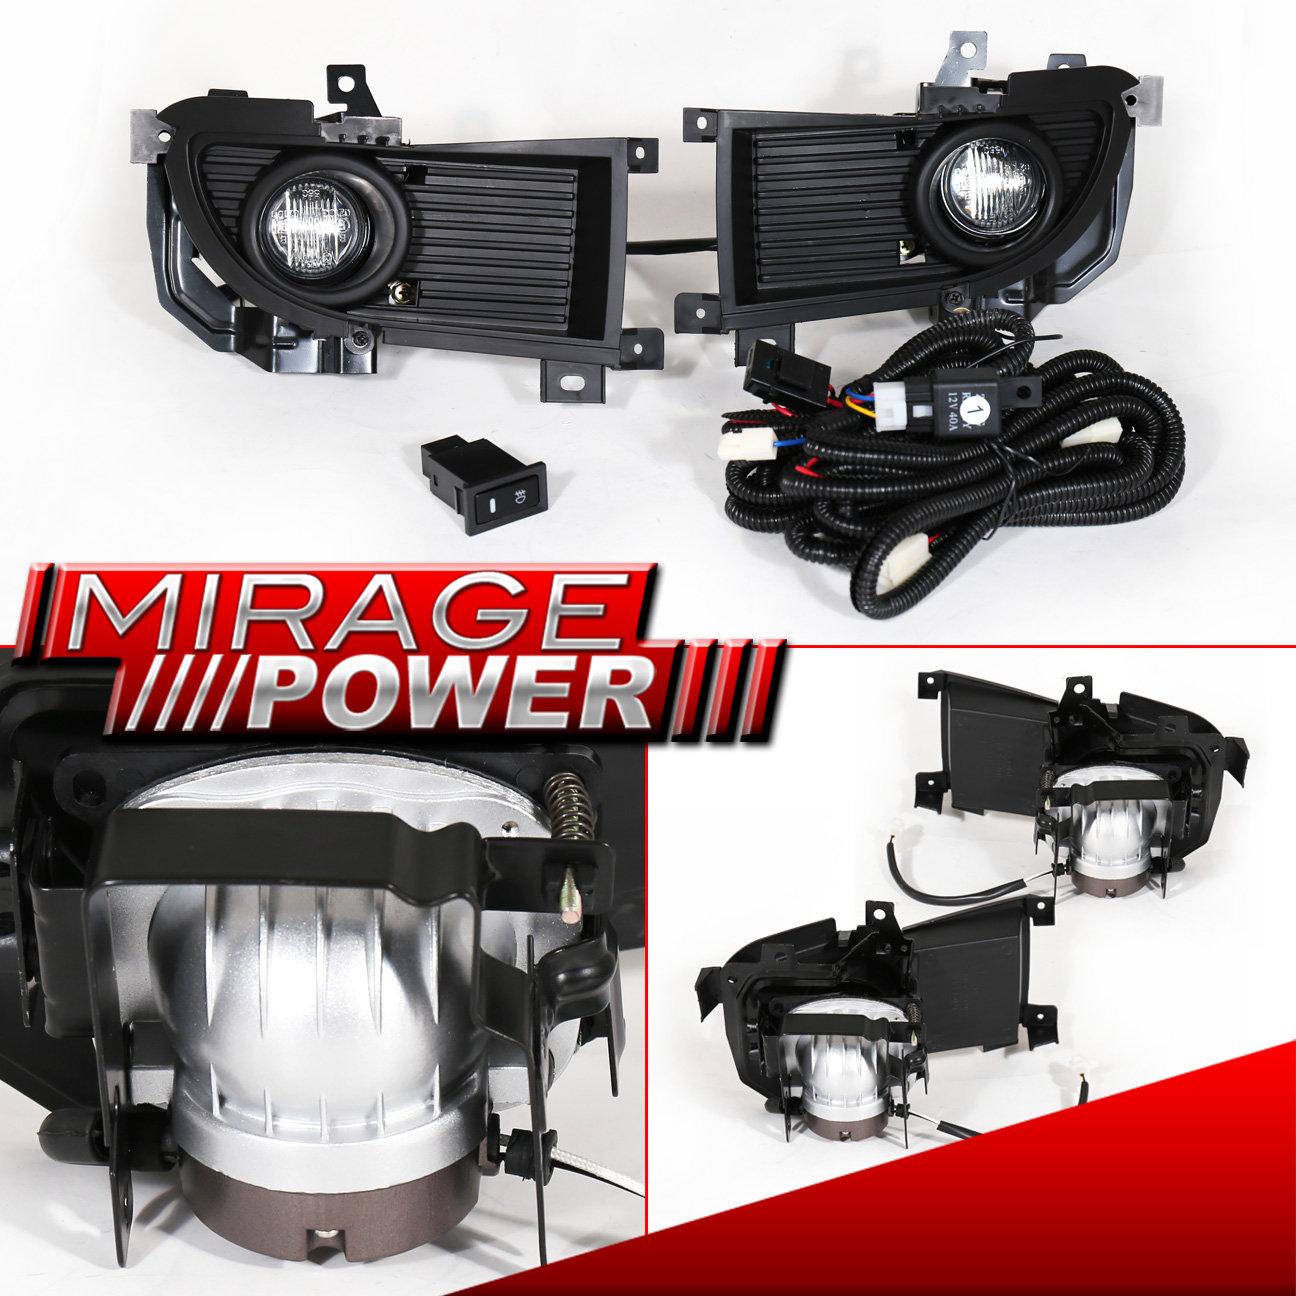 Mitsubishi 2004 mitsubishi lancer engine : 2004-2006 Mitsubishi Lancer Driving Clear Bumper Fog Lights ...